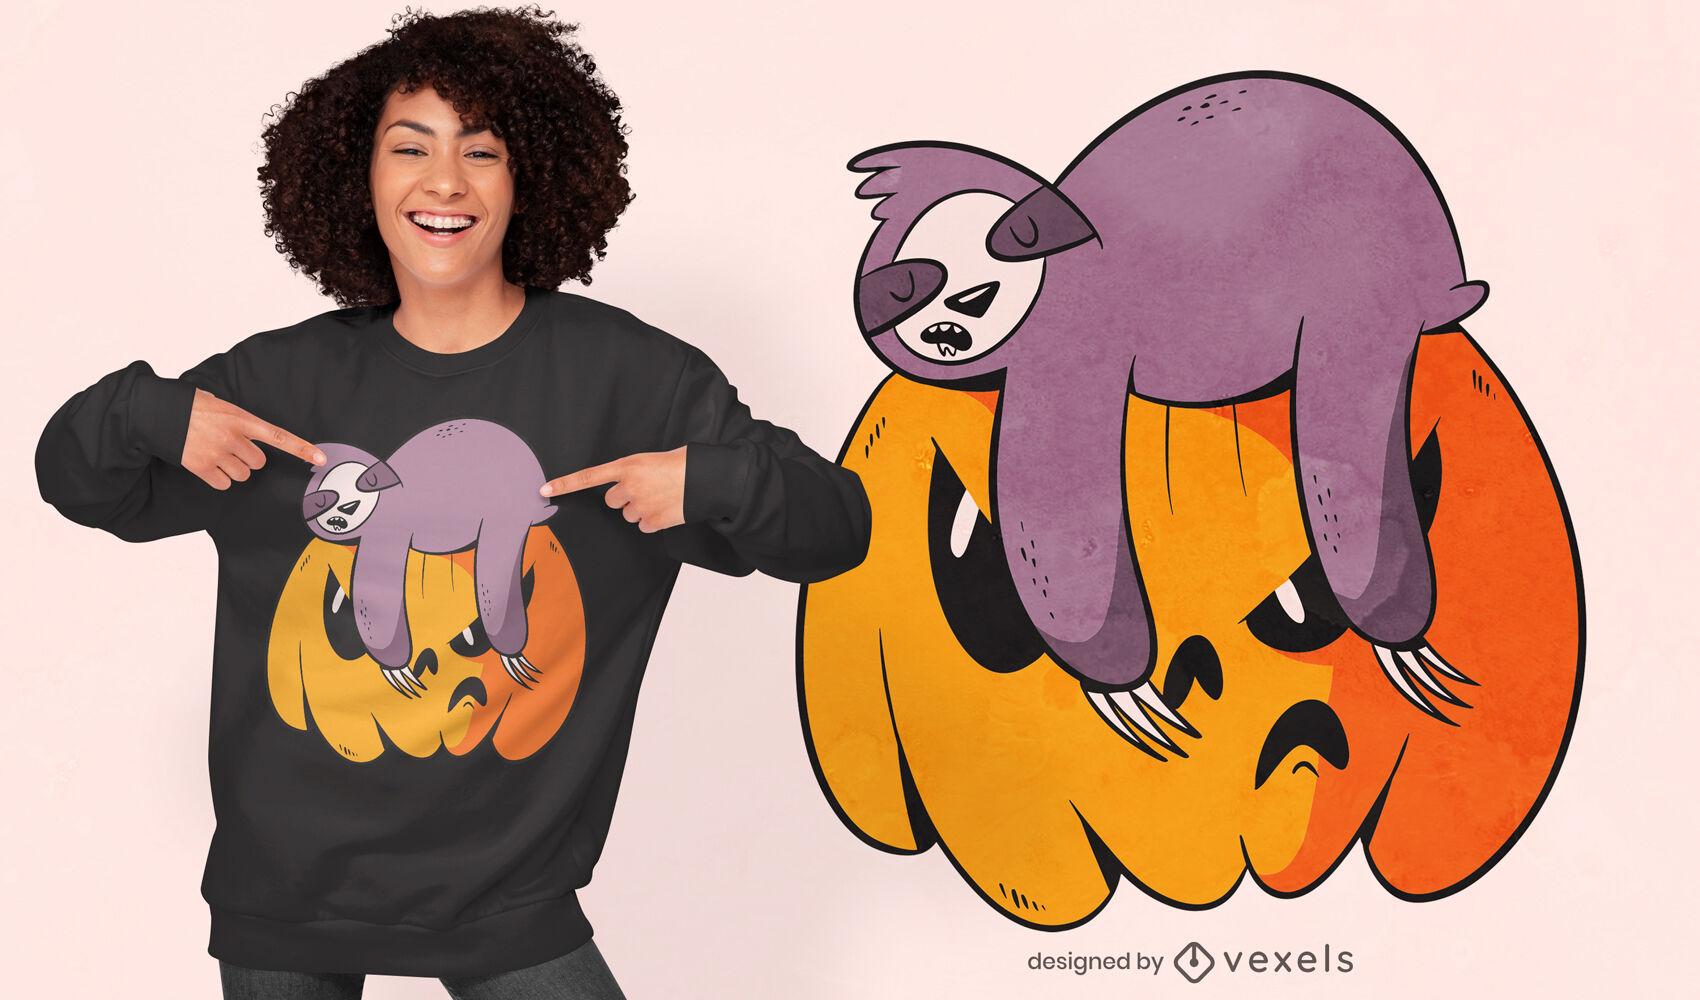 Funny sloth and pumpkin t-shirt design